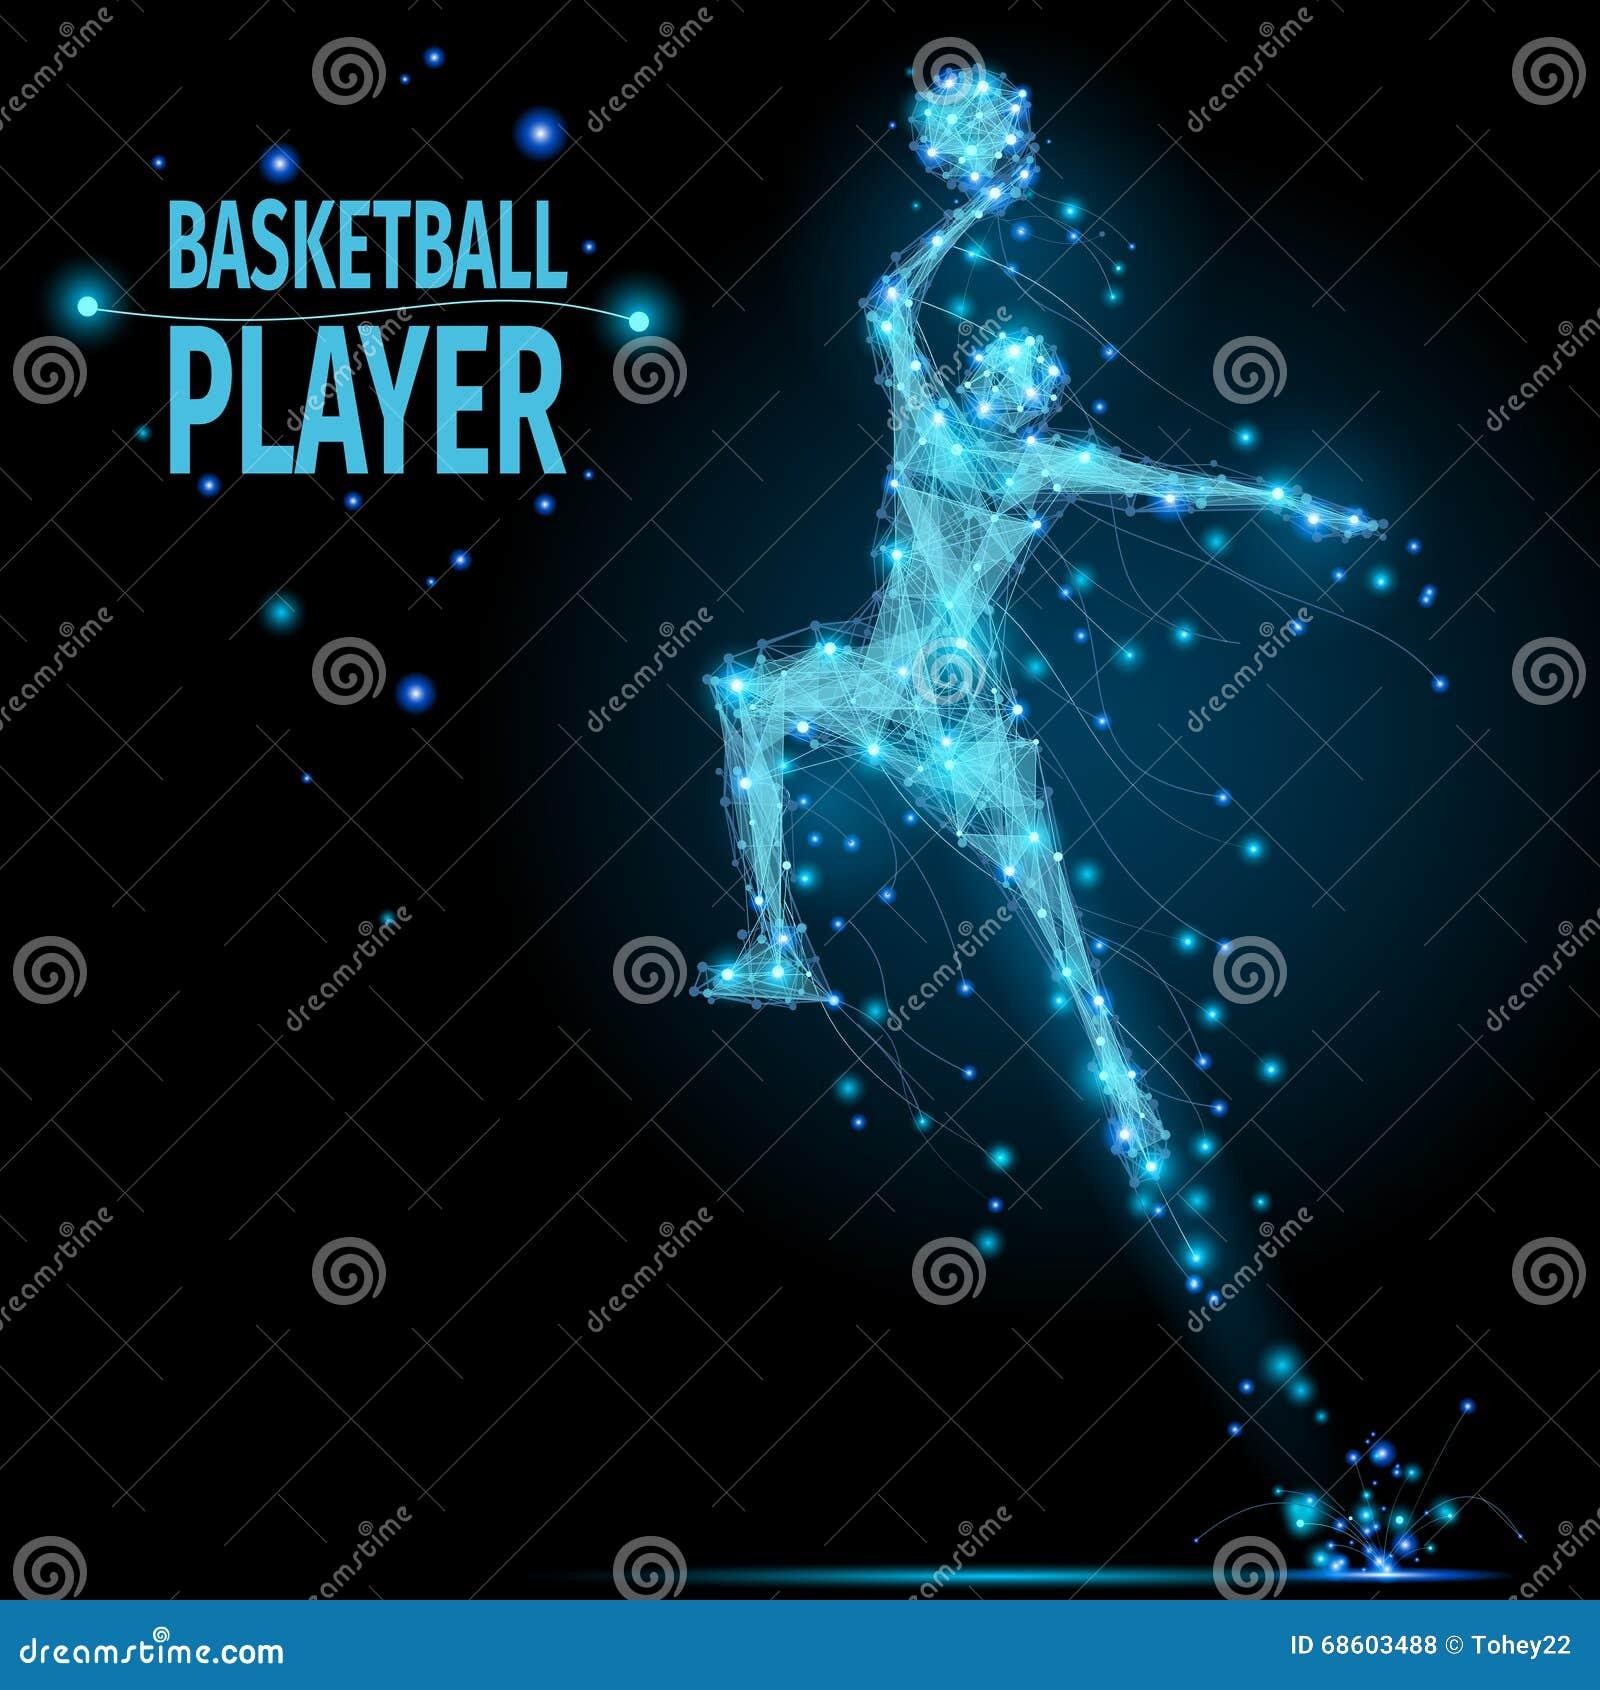 Basketball Player Polygonal Stock Vector - Illustration of